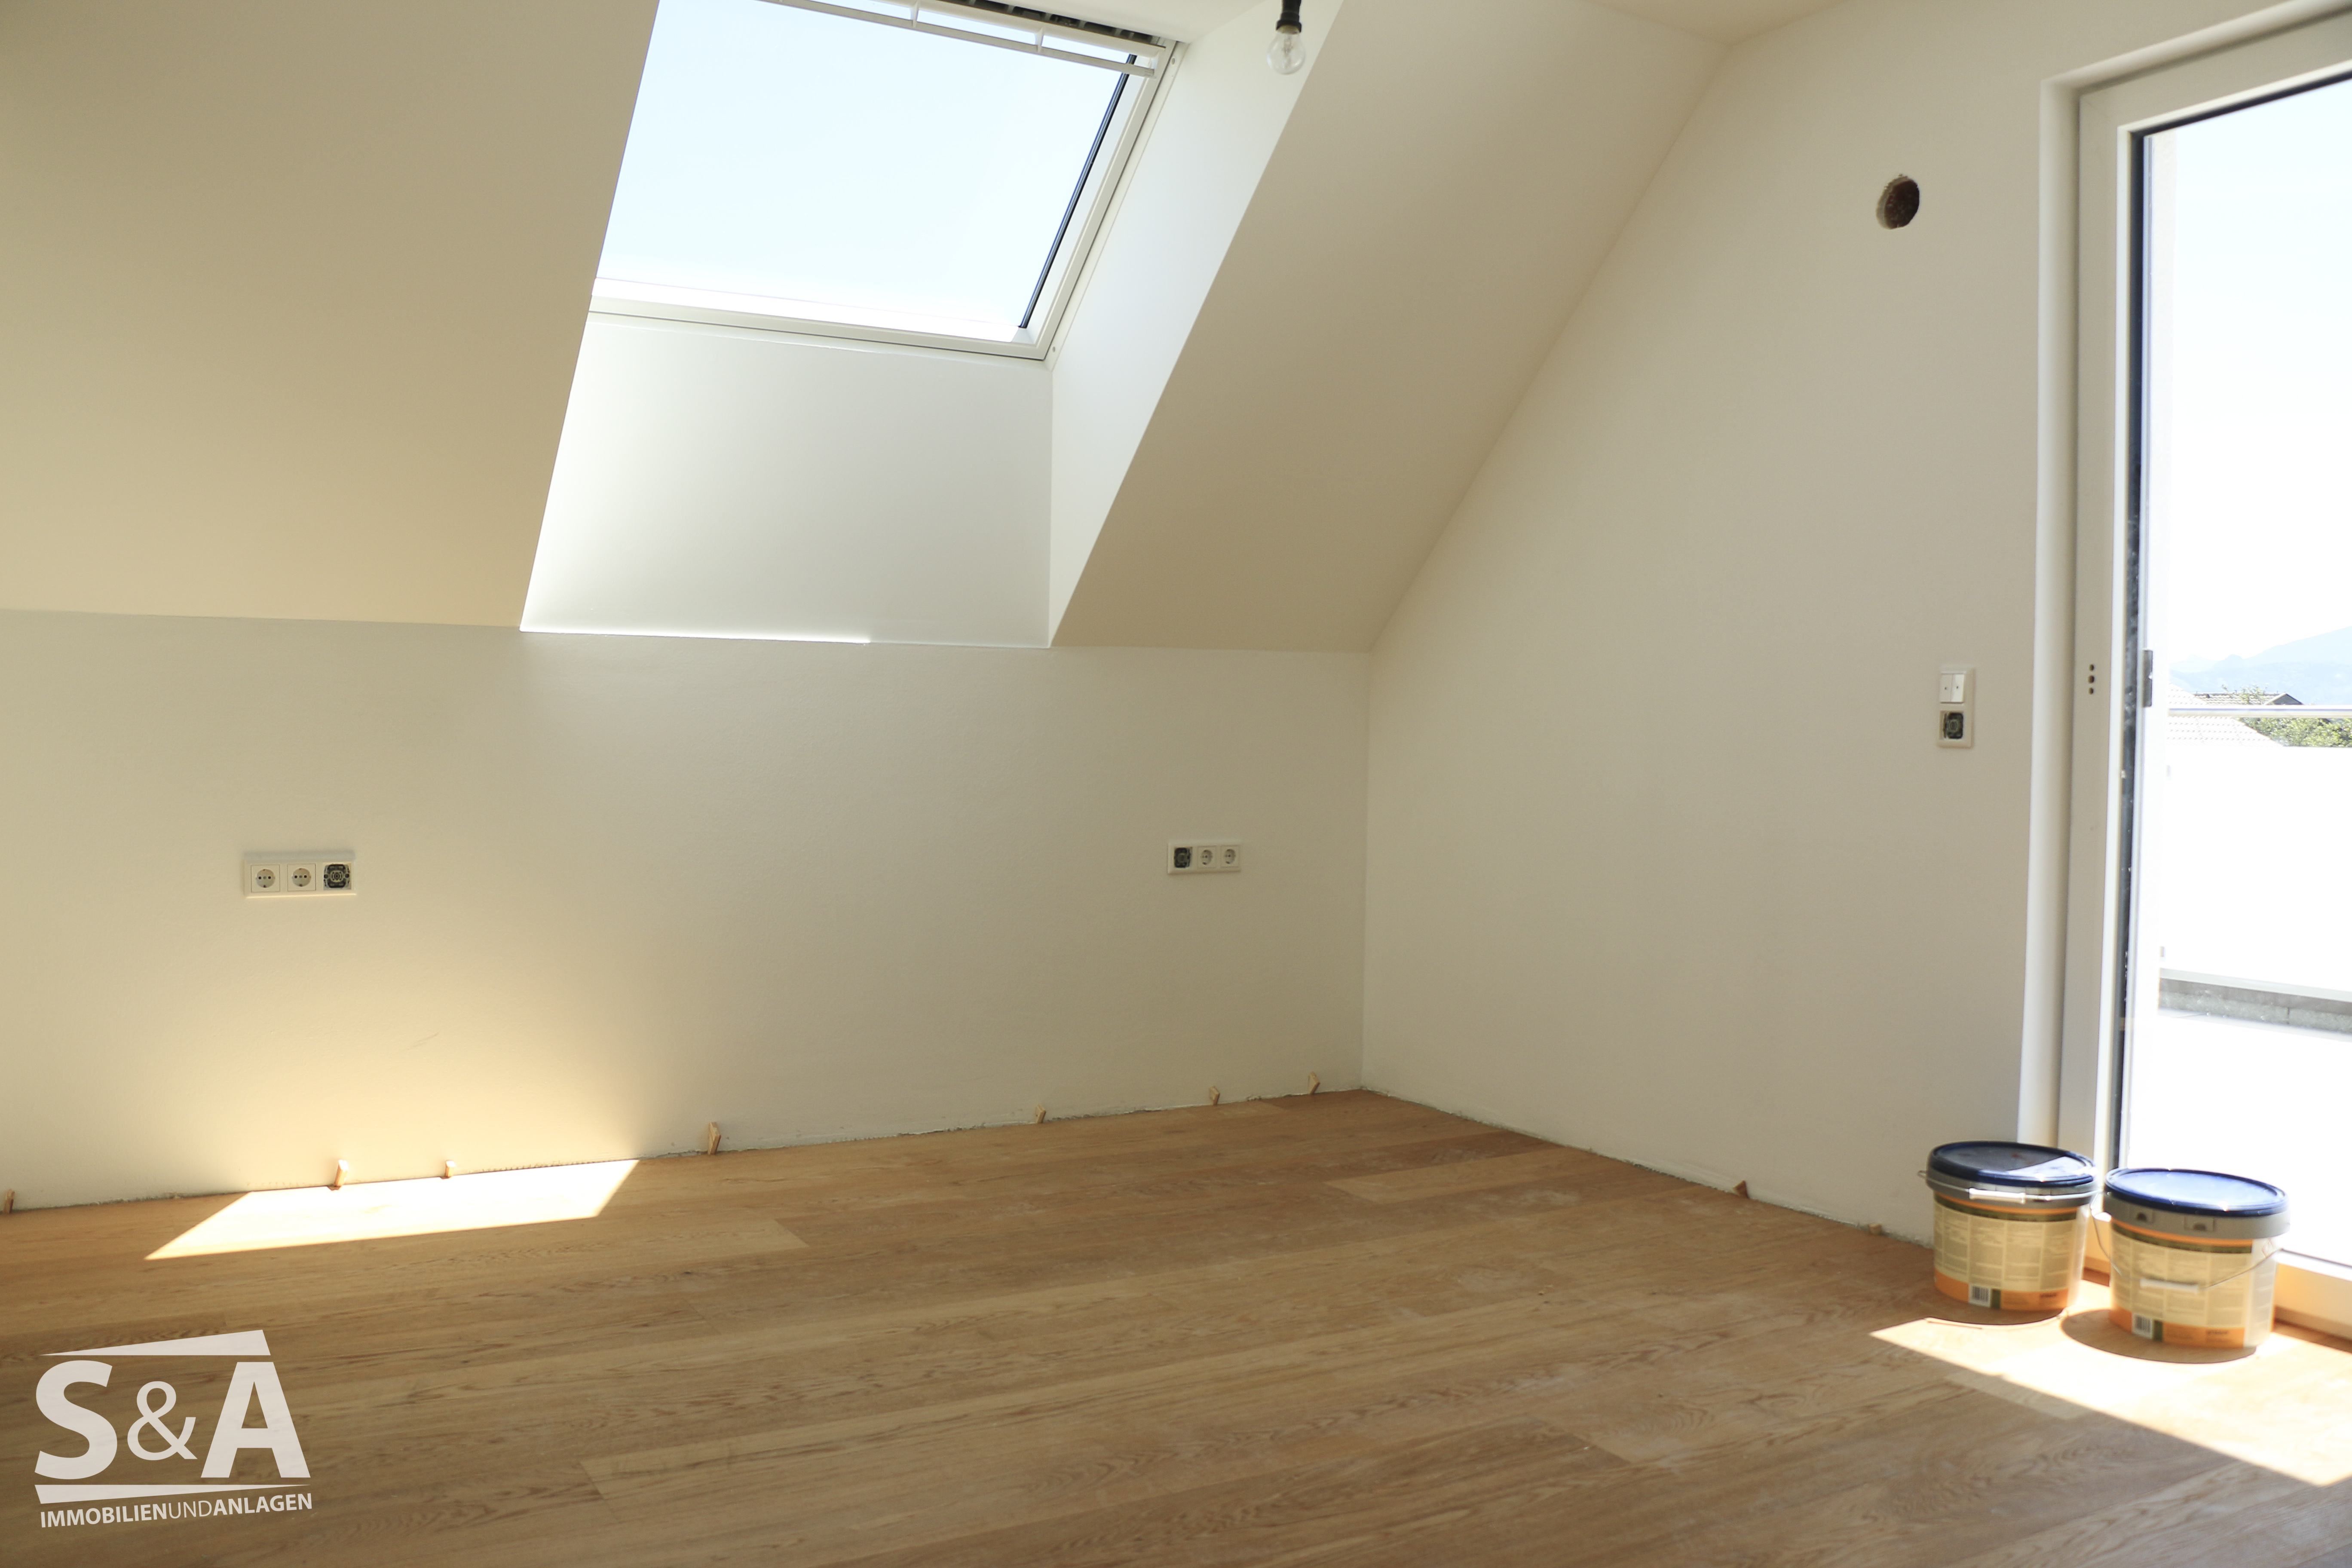 S&A Immobilien_Kraiham-17